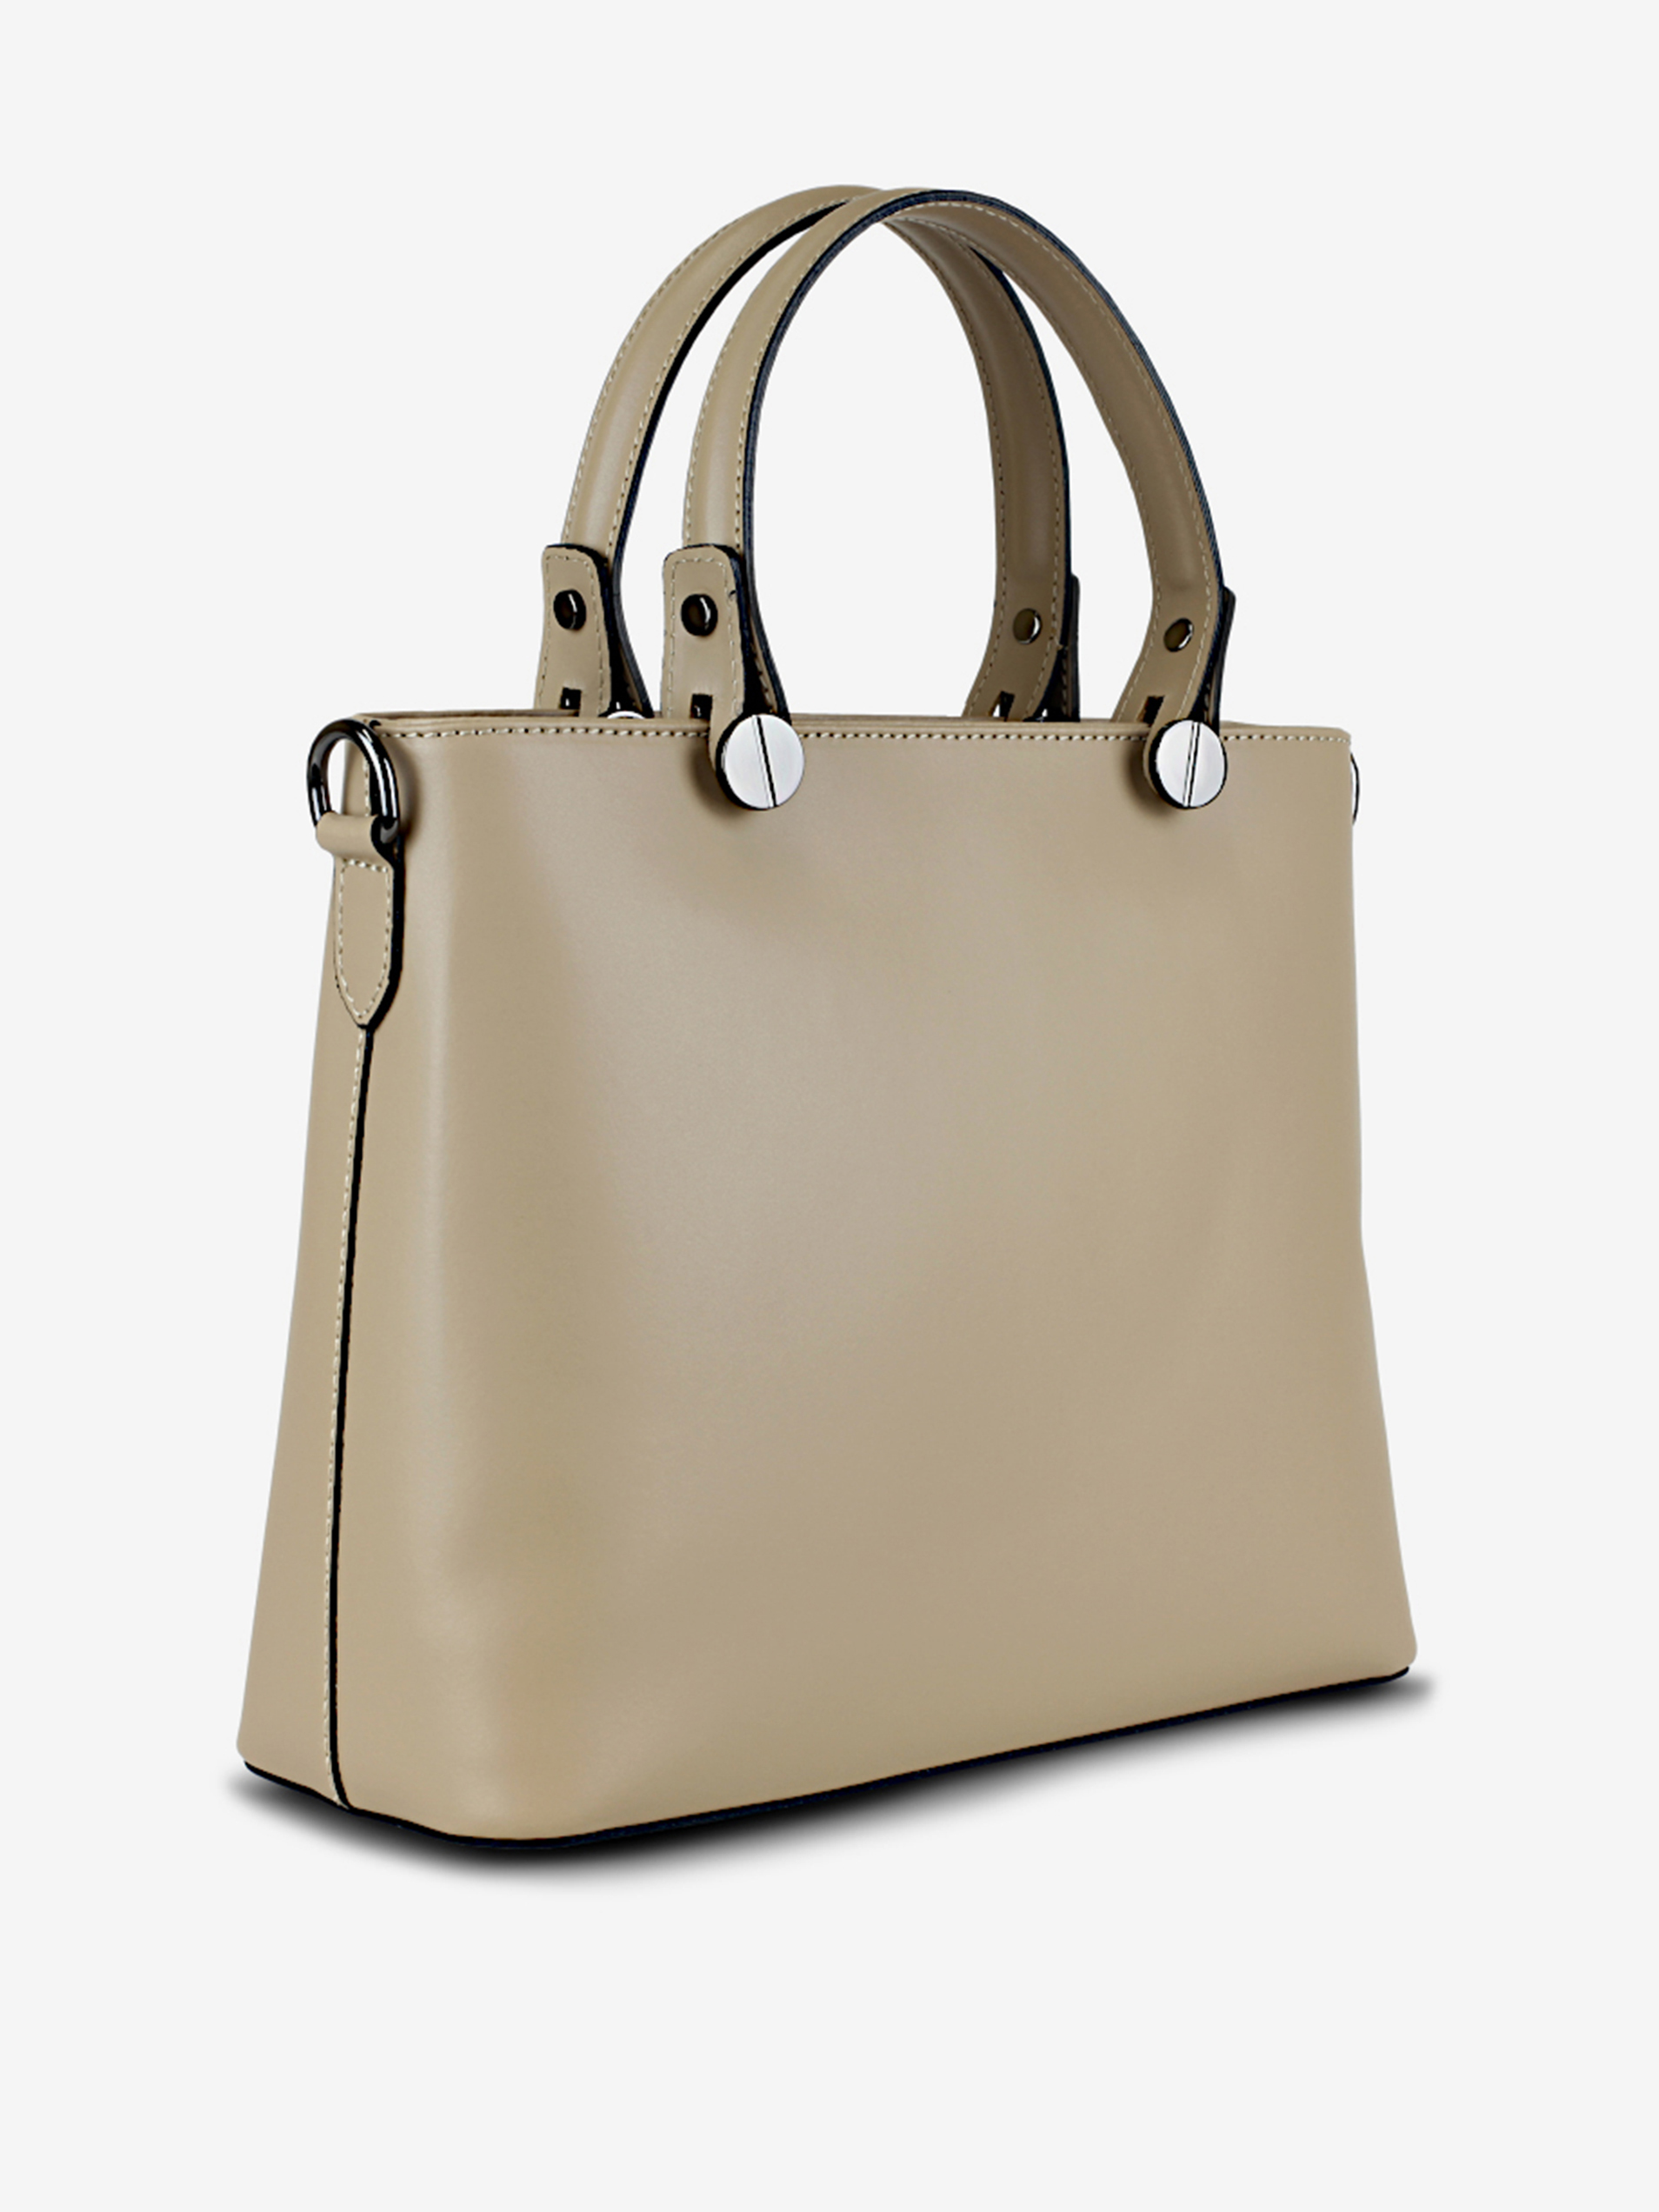 Béžová dámská kožená kabelka KARA